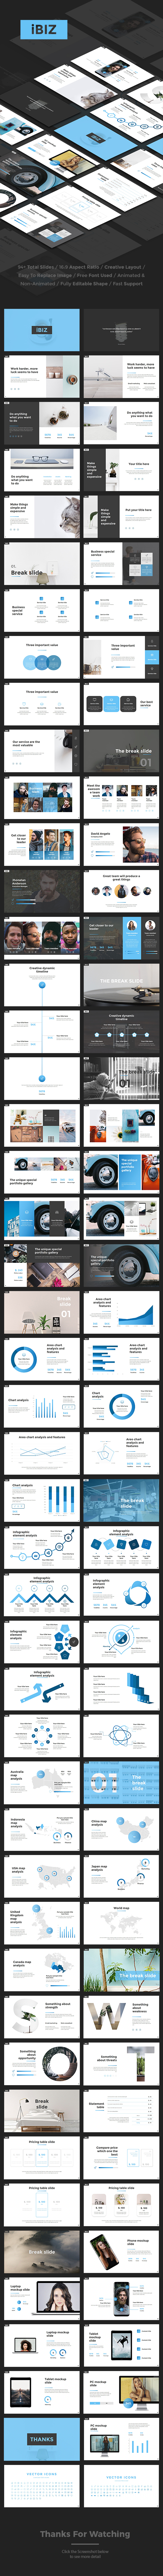 iBiz - Business Keynote Template - Business PowerPoint Templates